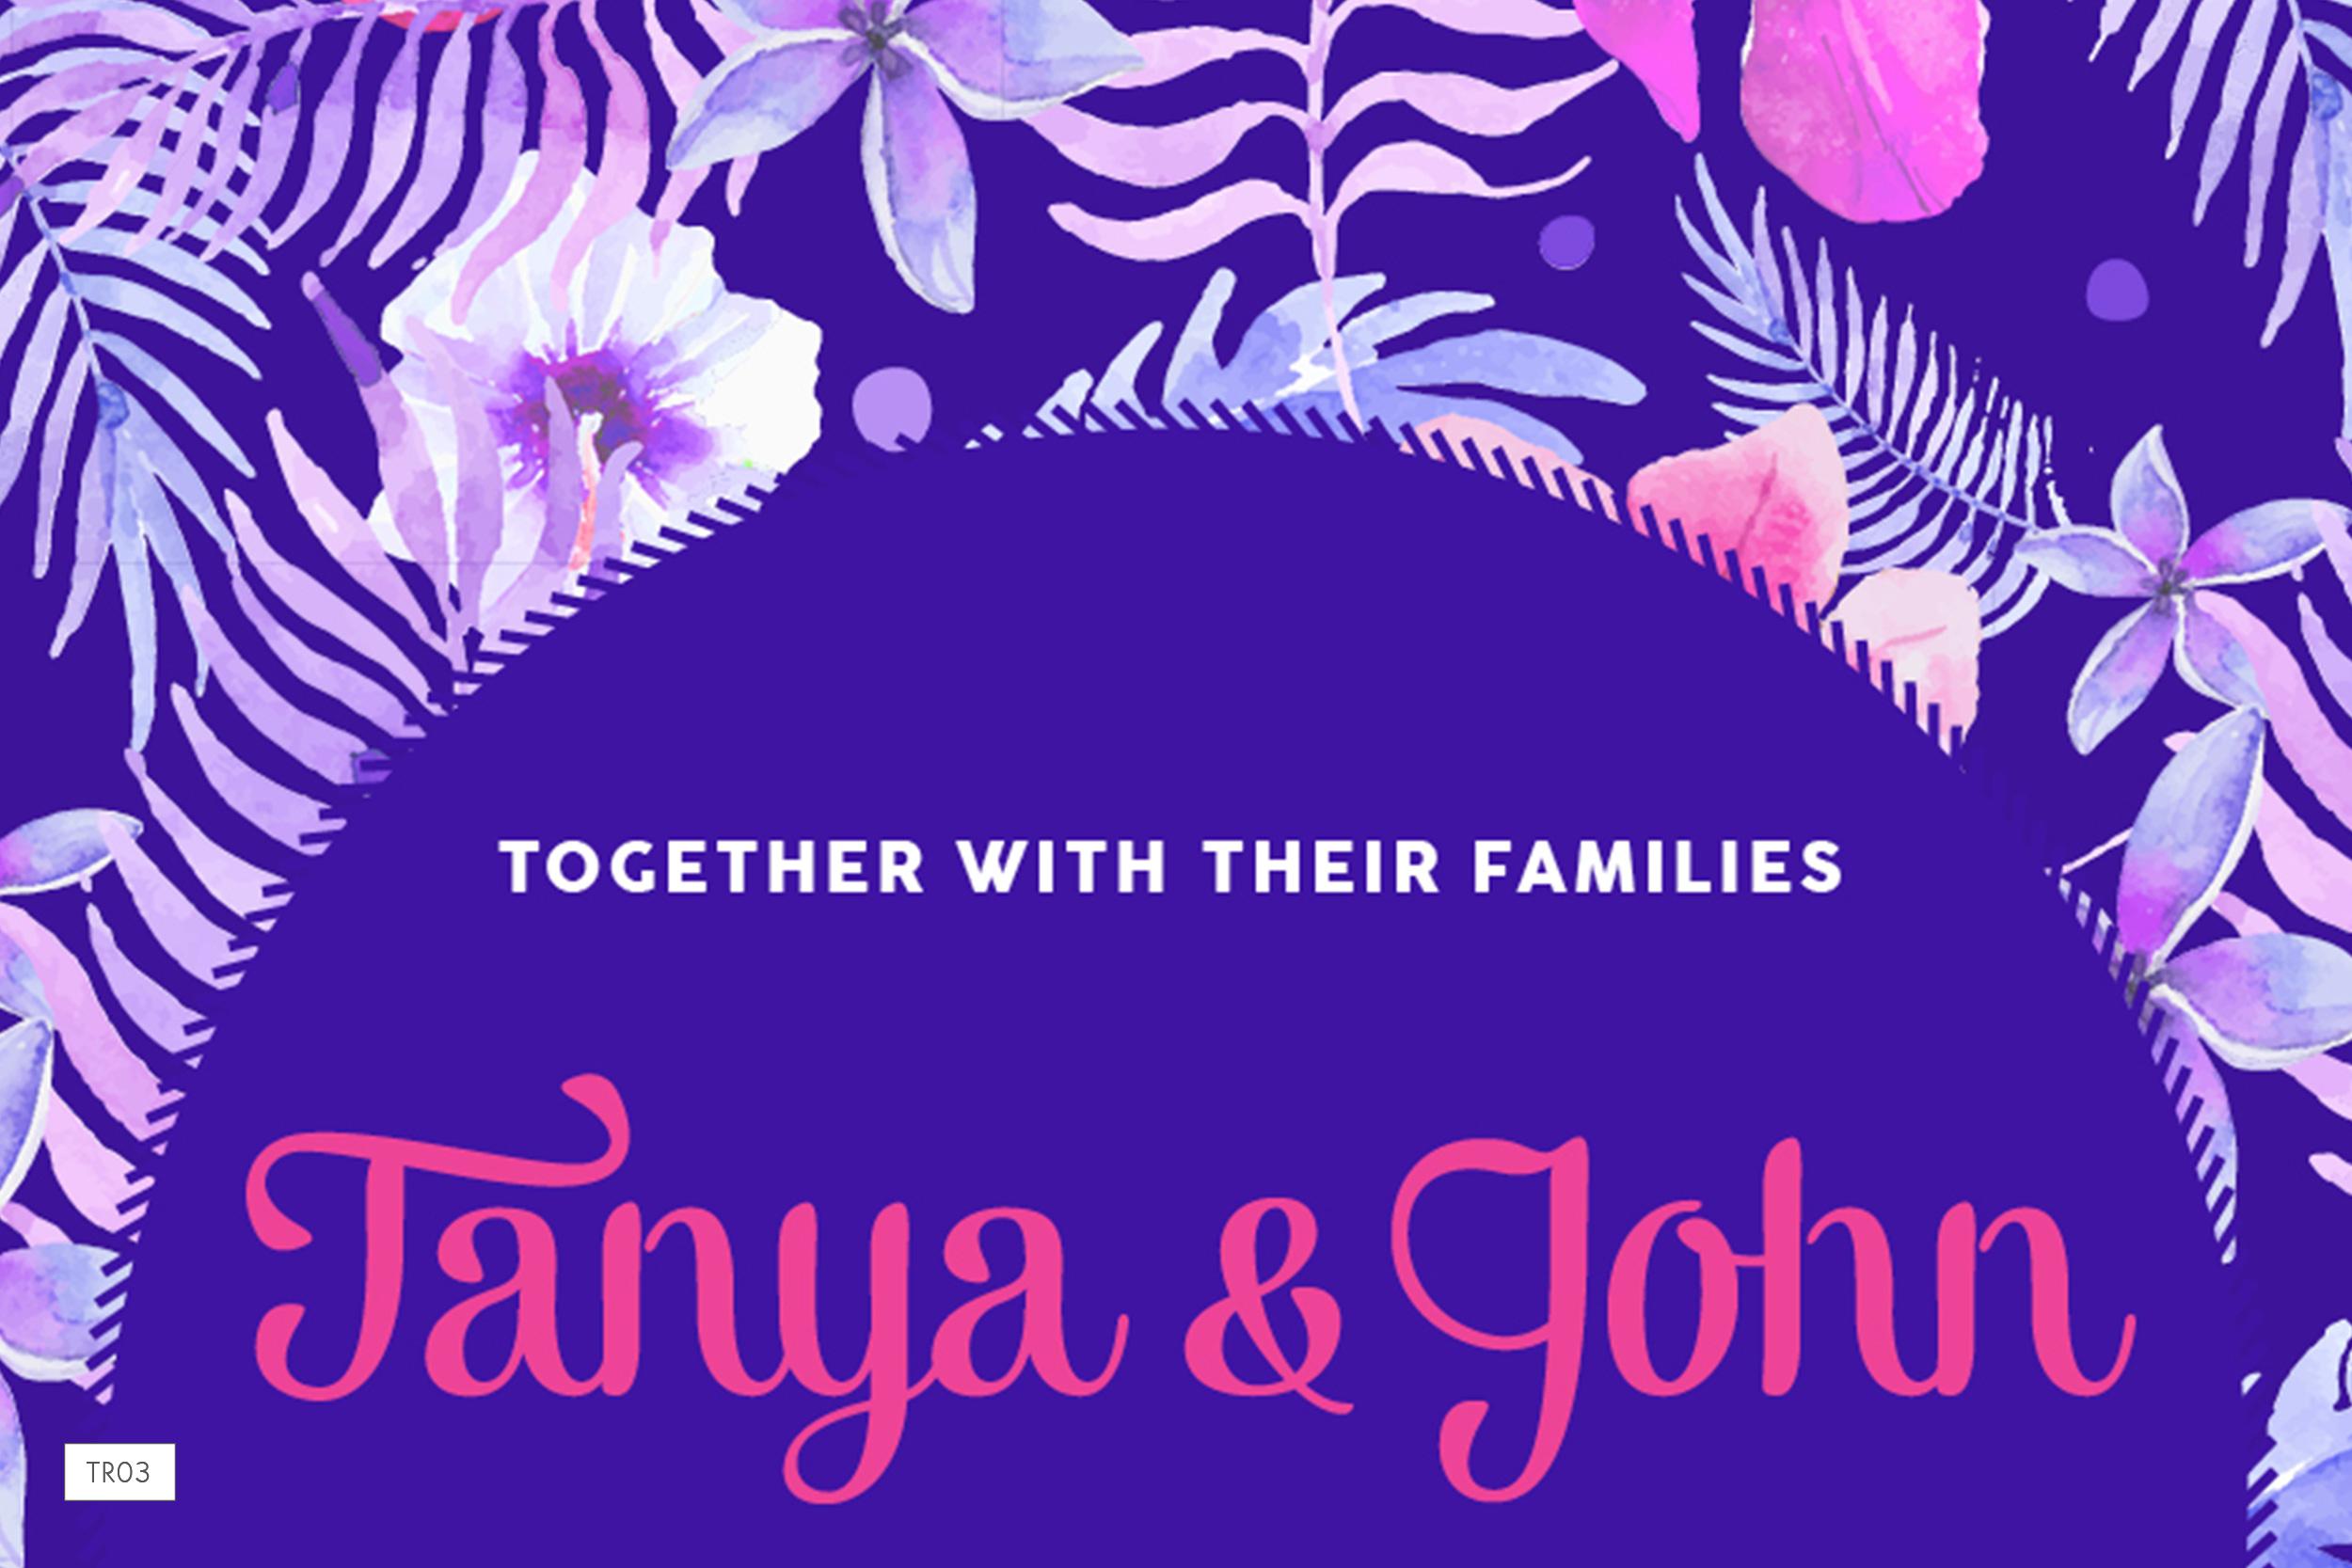 tr03-tropics-wedding-invitation-details.jpg